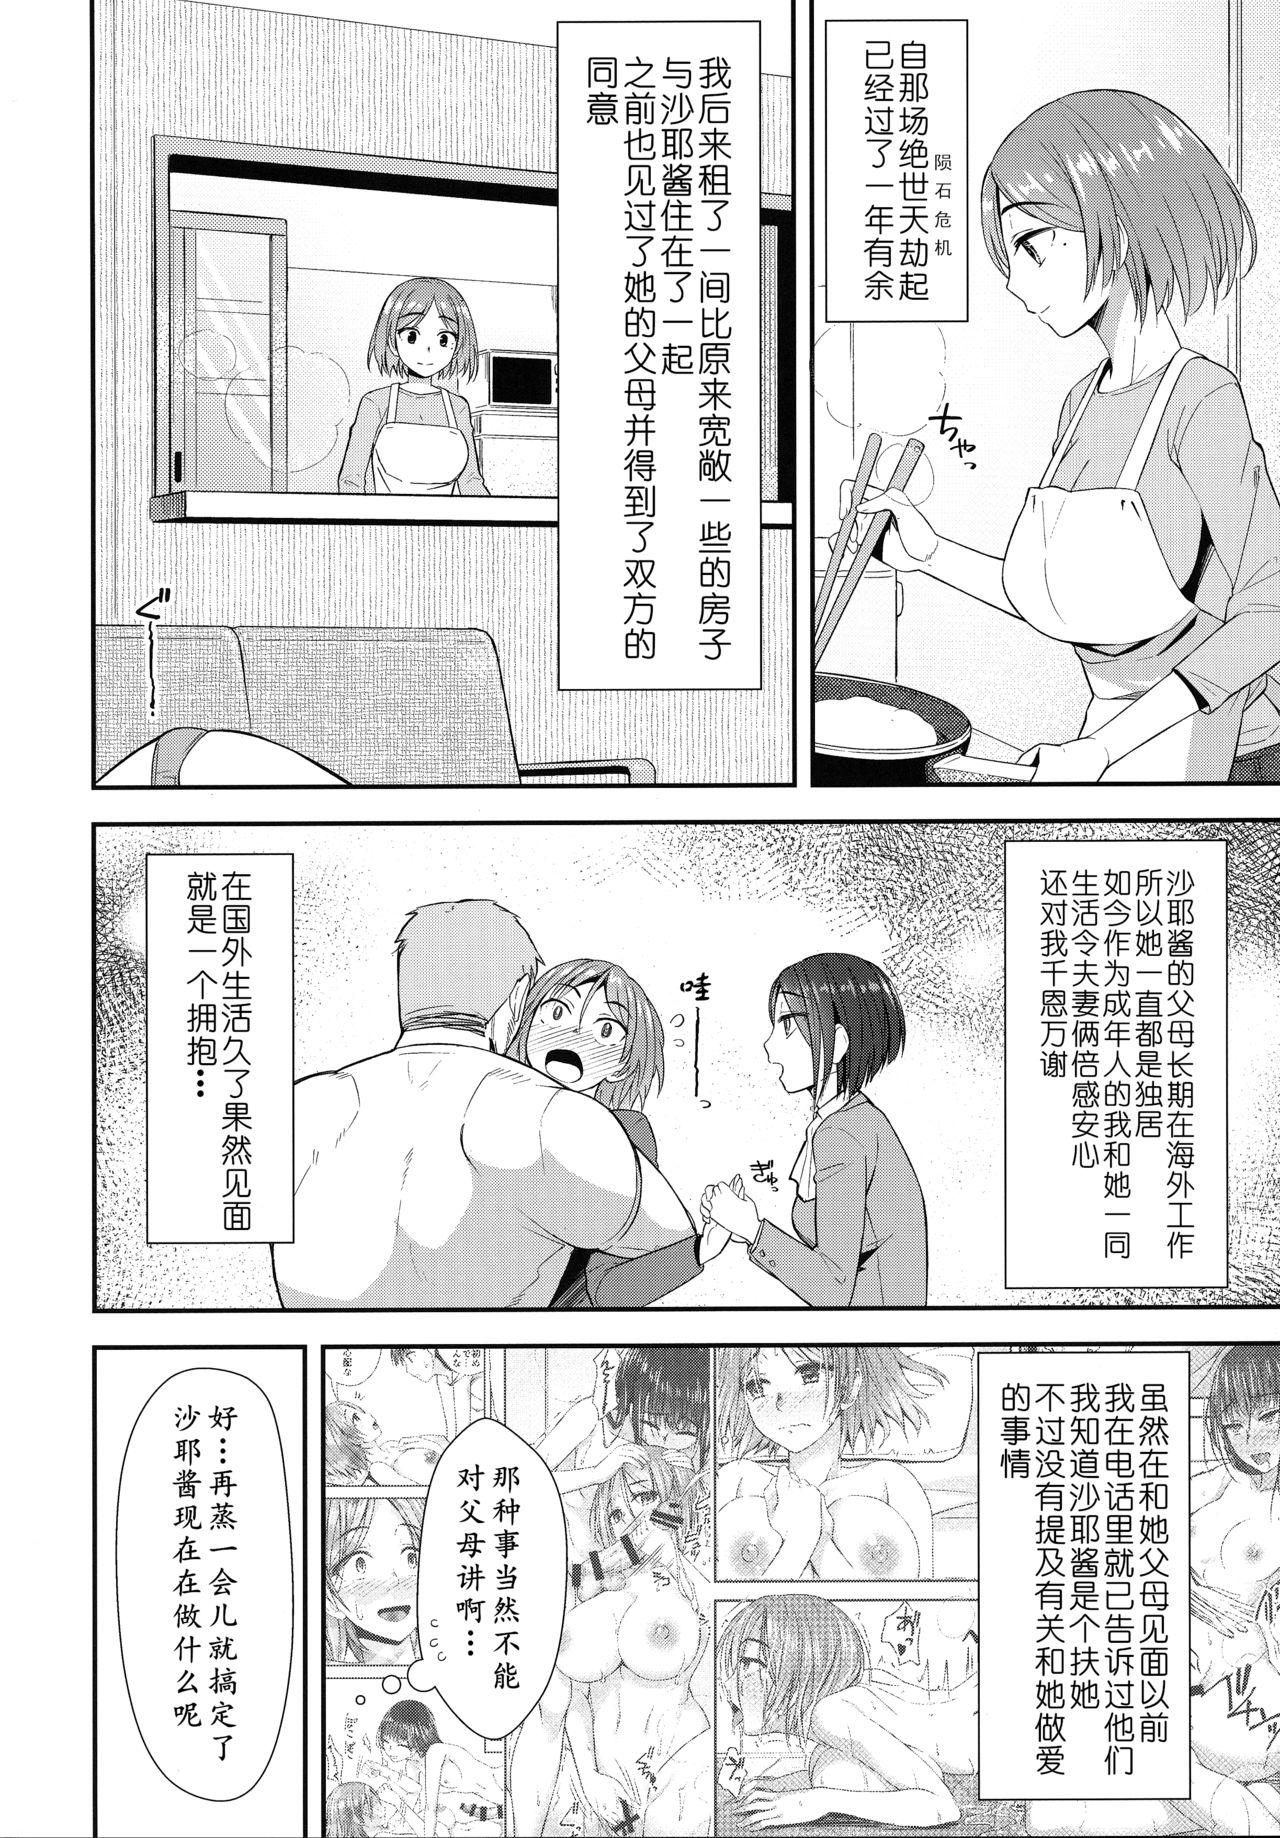 Shuumatsugo Dousei Girls | 终末前的破处少女 2 3